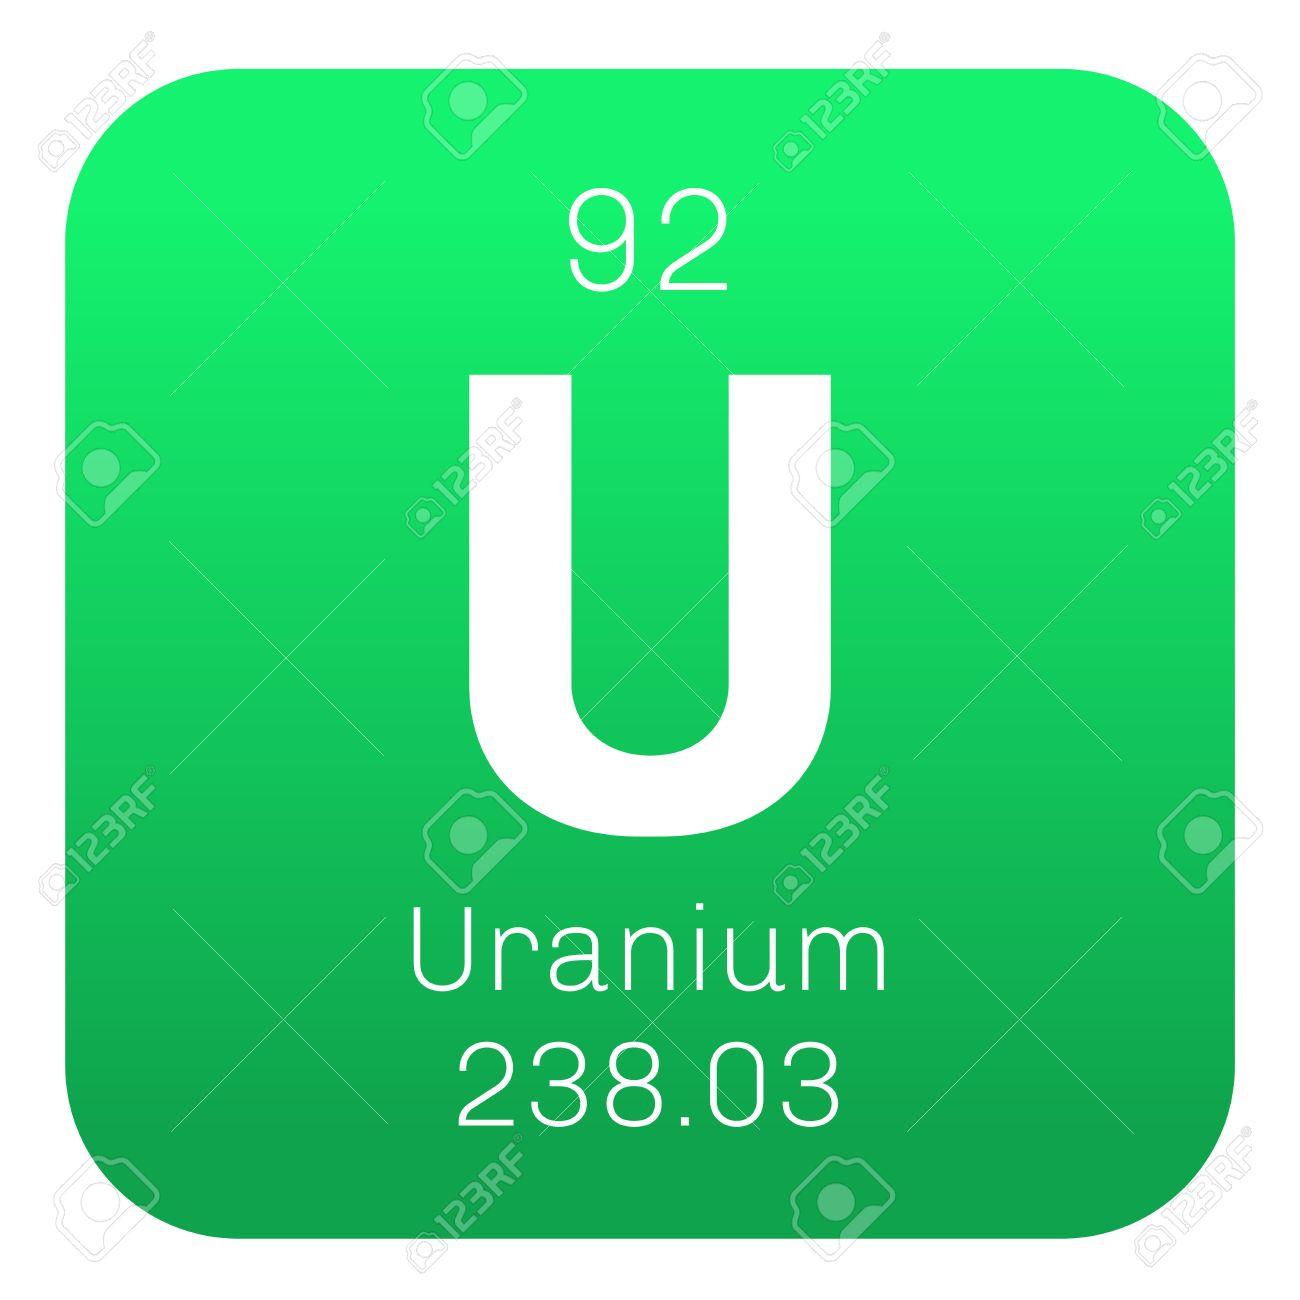 Uranium chemical element uranium is weakly radioactive metal uranium chemical element uranium is weakly radioactive metal colored icon with atomic number and gamestrikefo Choice Image